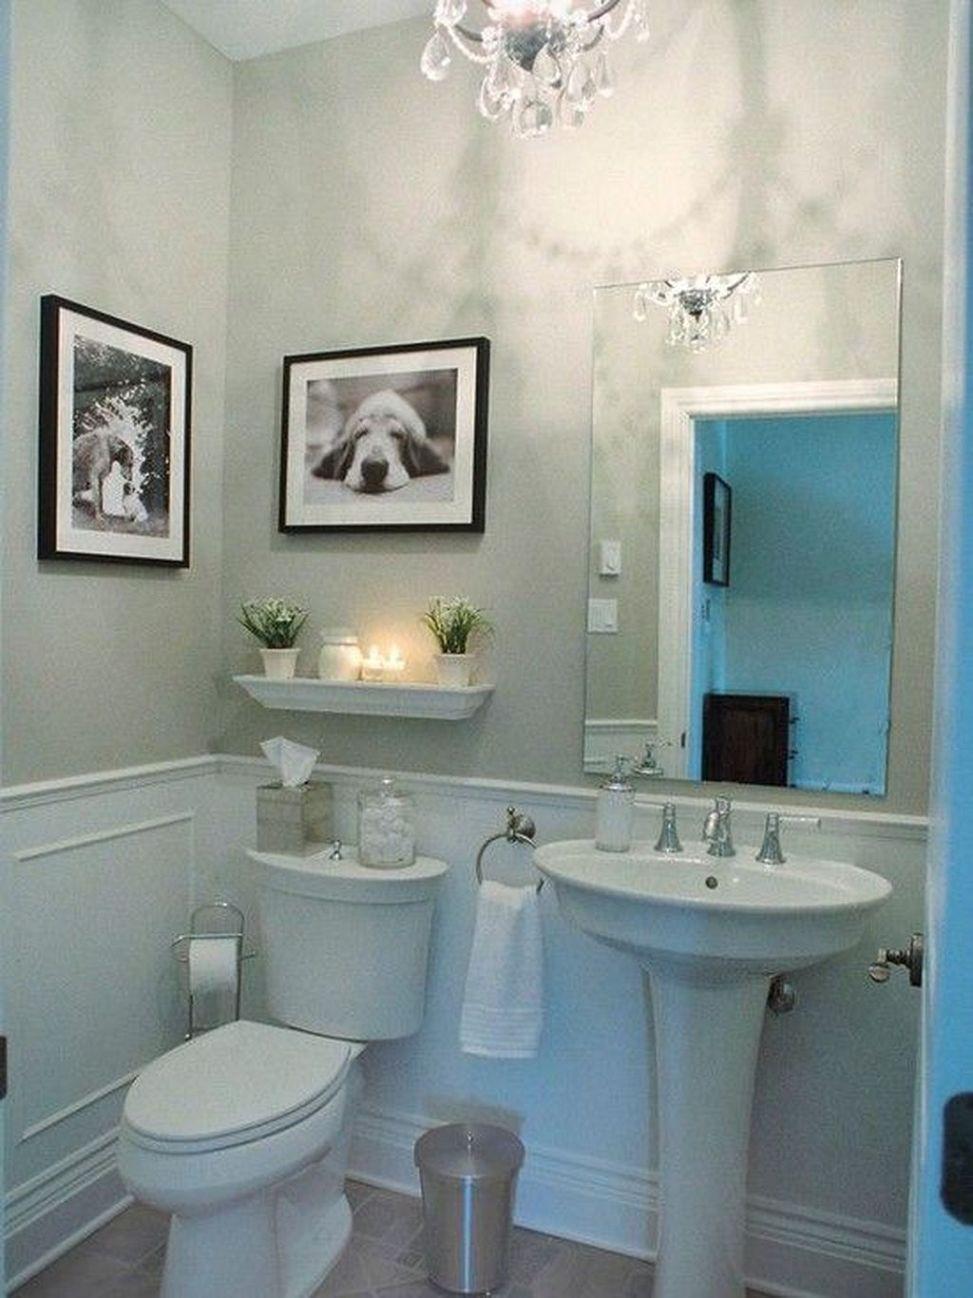 Half Bathroom Ideas Precious Tips And Inspirations With Images Small Half Bathrooms Powder Room Decor Half Bathroom Decor